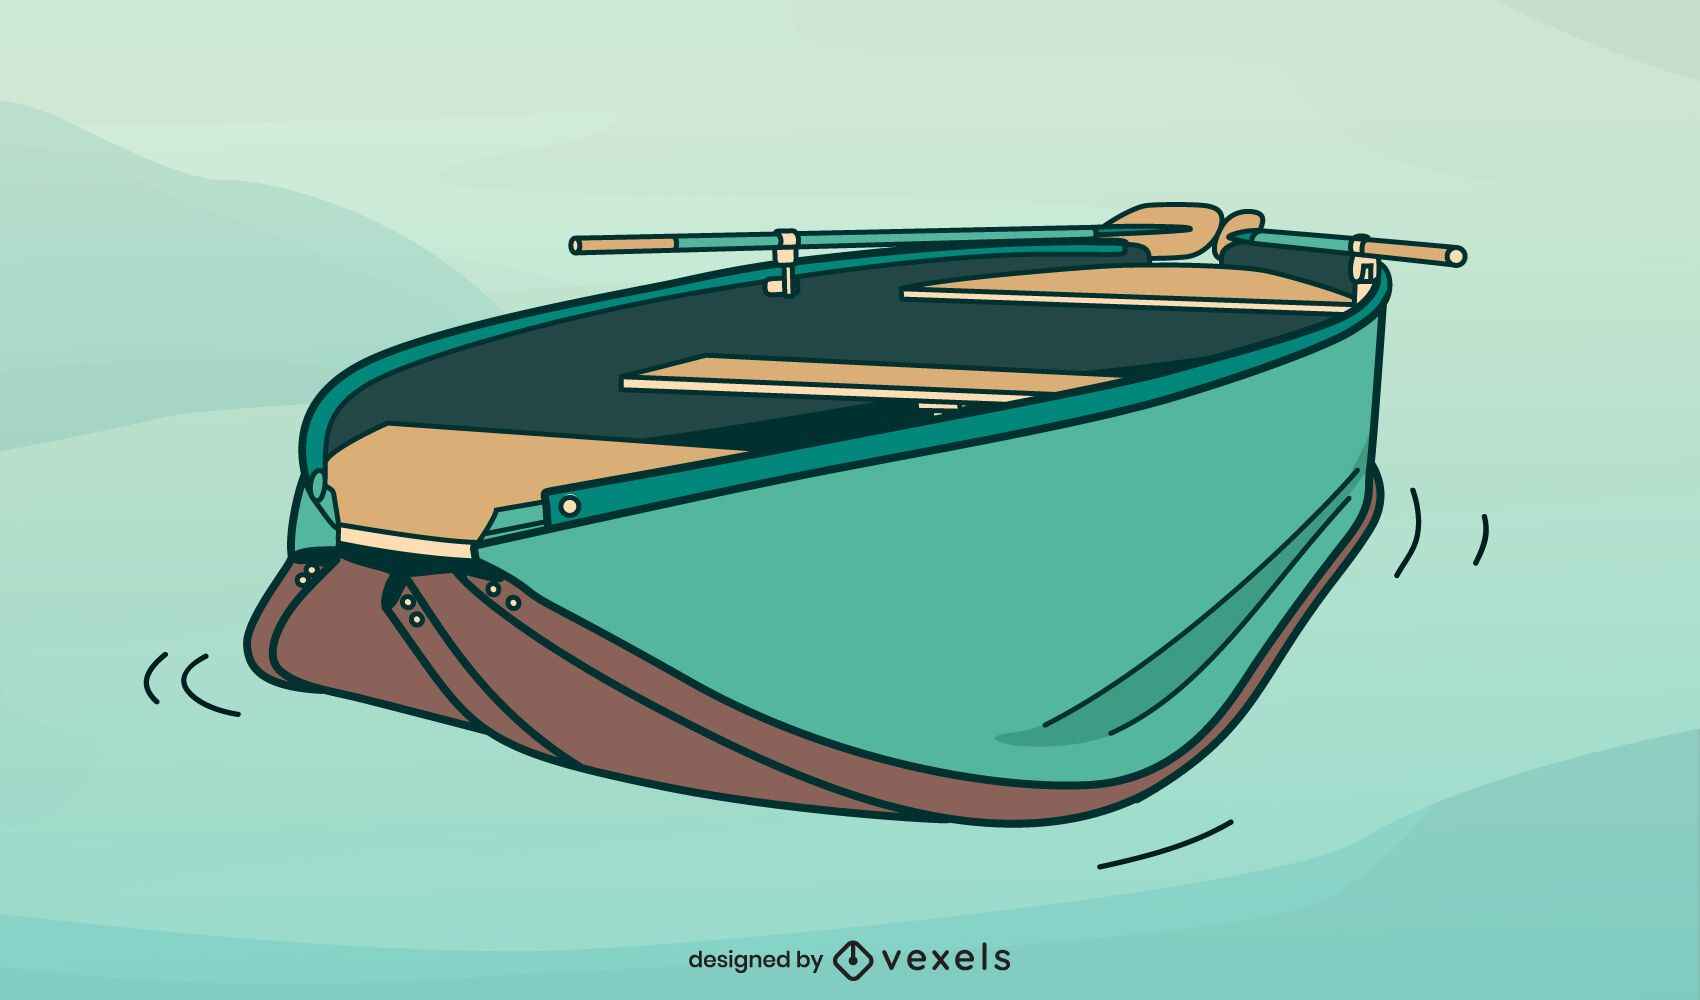 Foalding boat illustration design